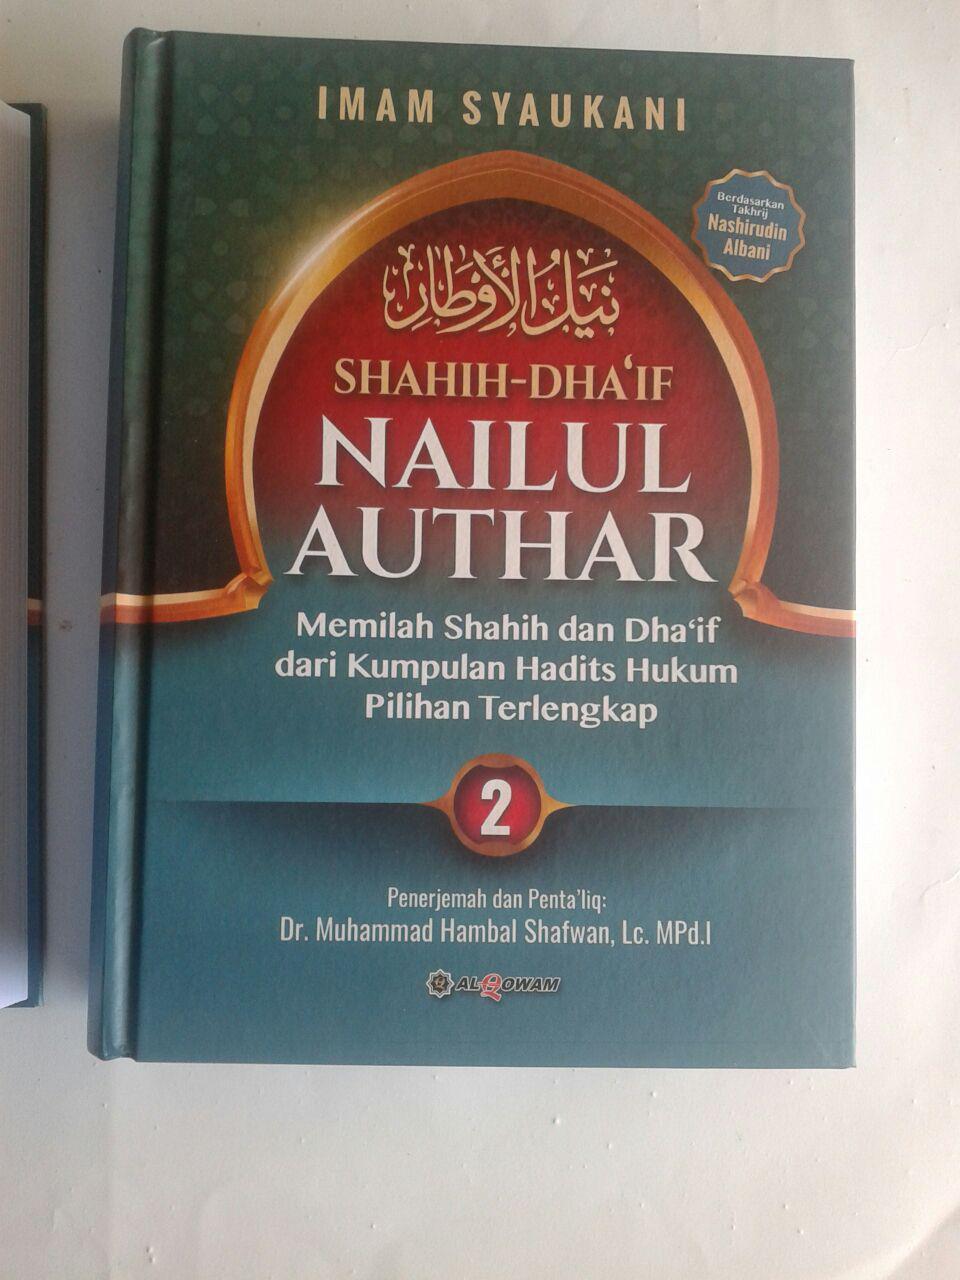 Buku Shahih Dhaif Nailul Authar Kumpulan Hadits Hukum Terlengkap cover 2